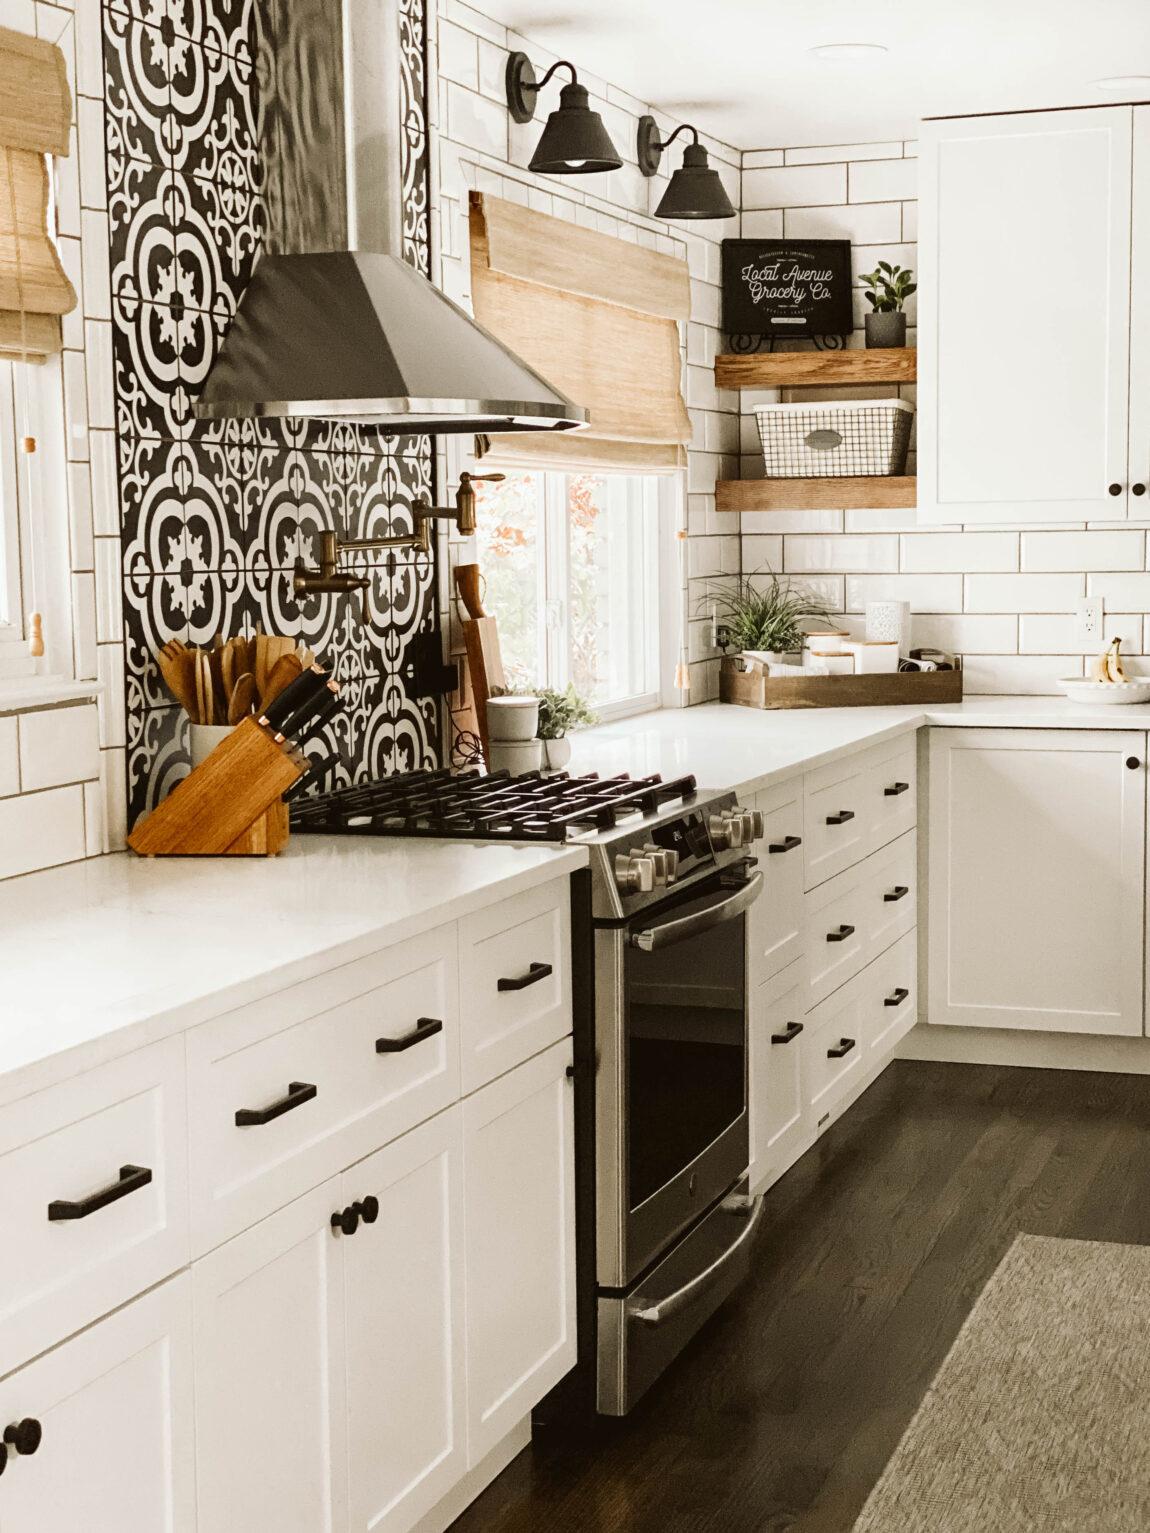 Clark and Aldine Kitchen remodel.